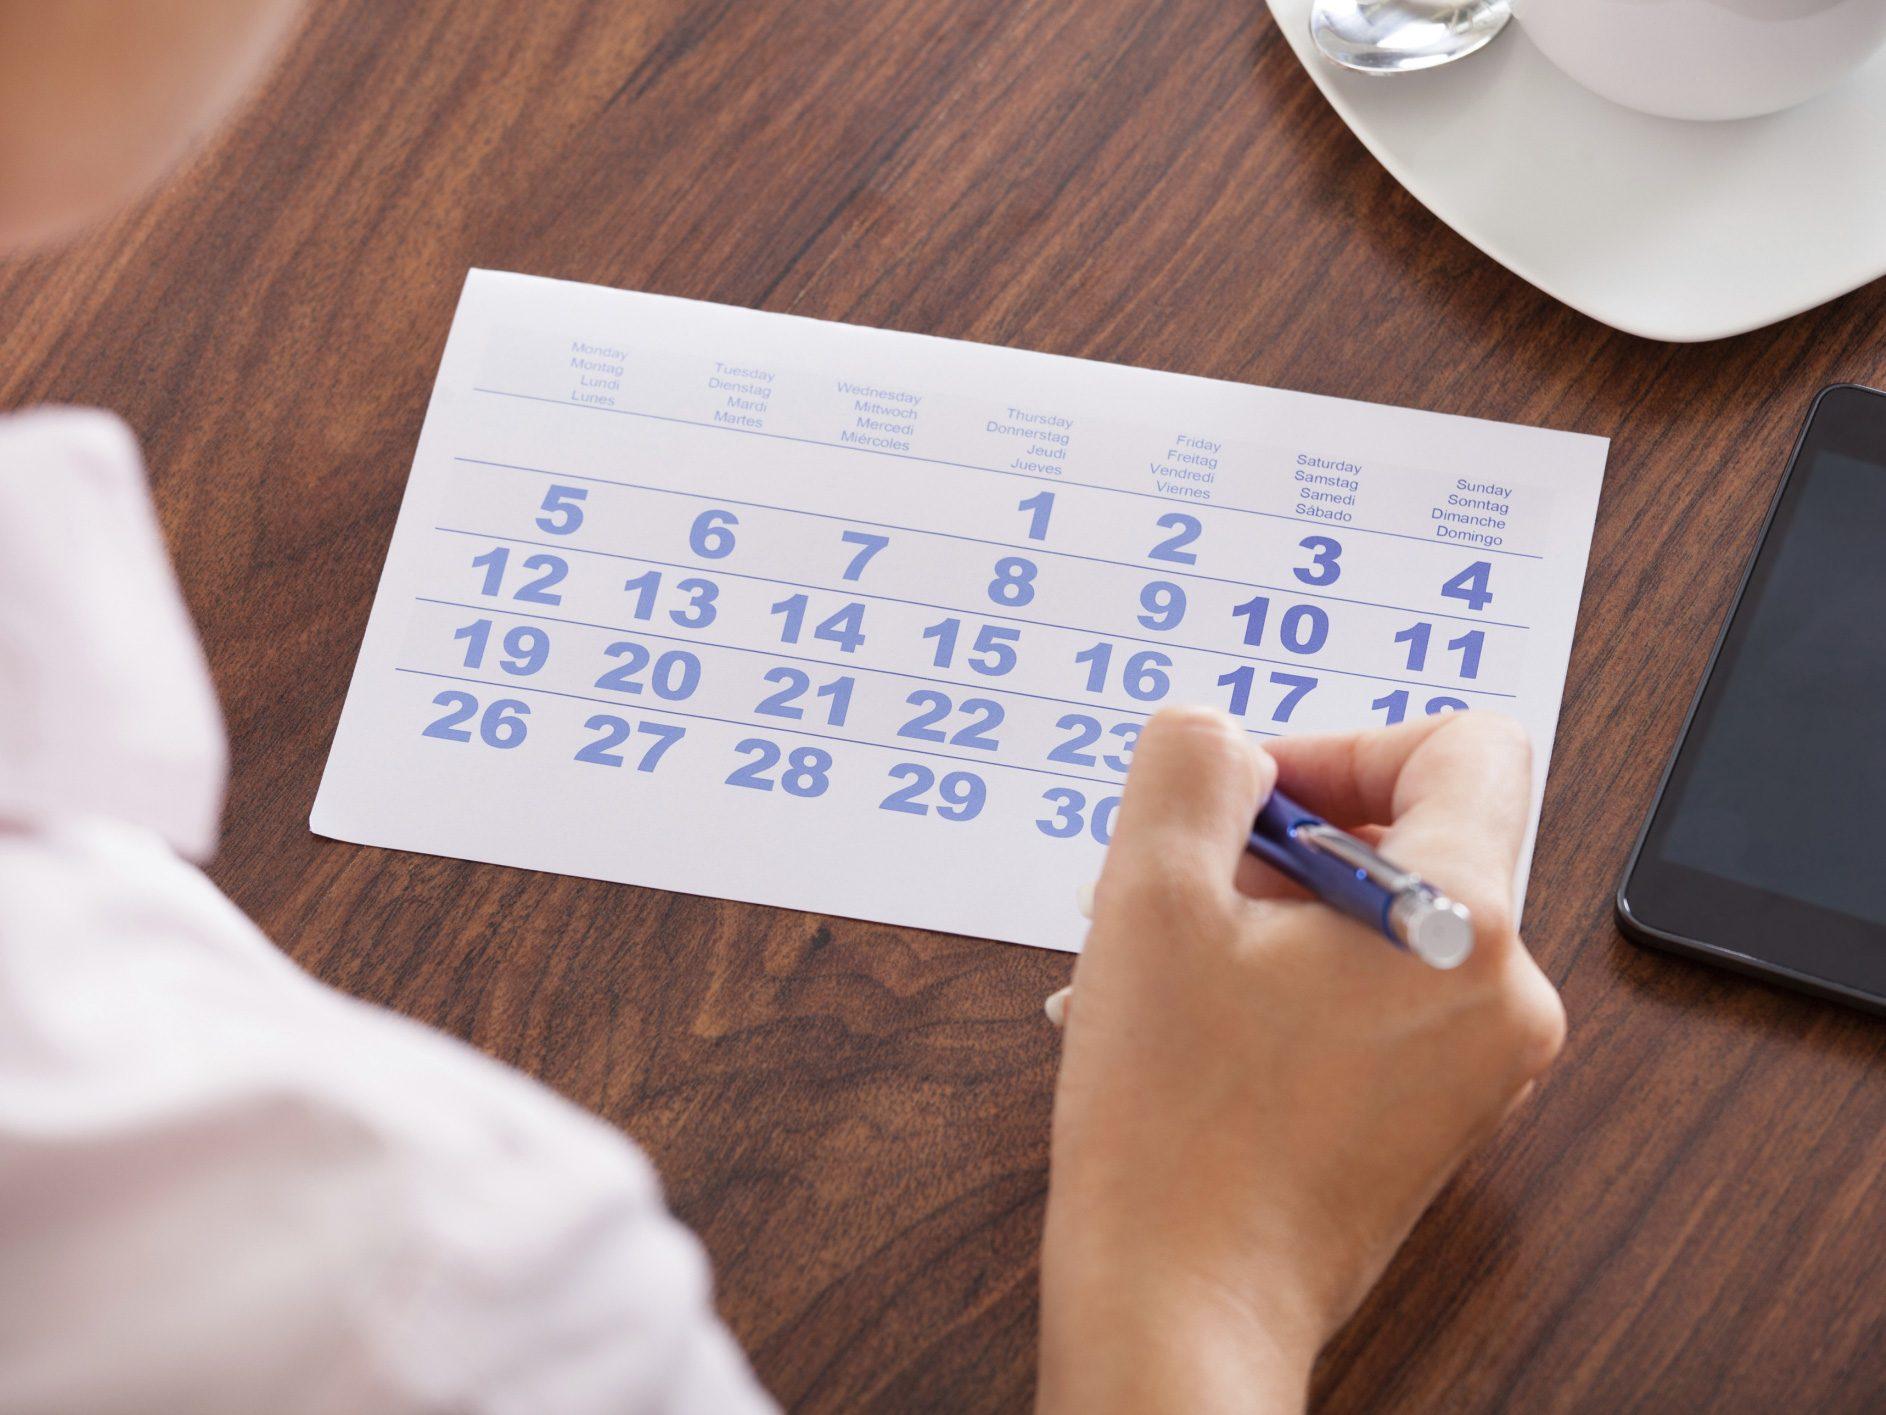 Put Everything on Your Calendar